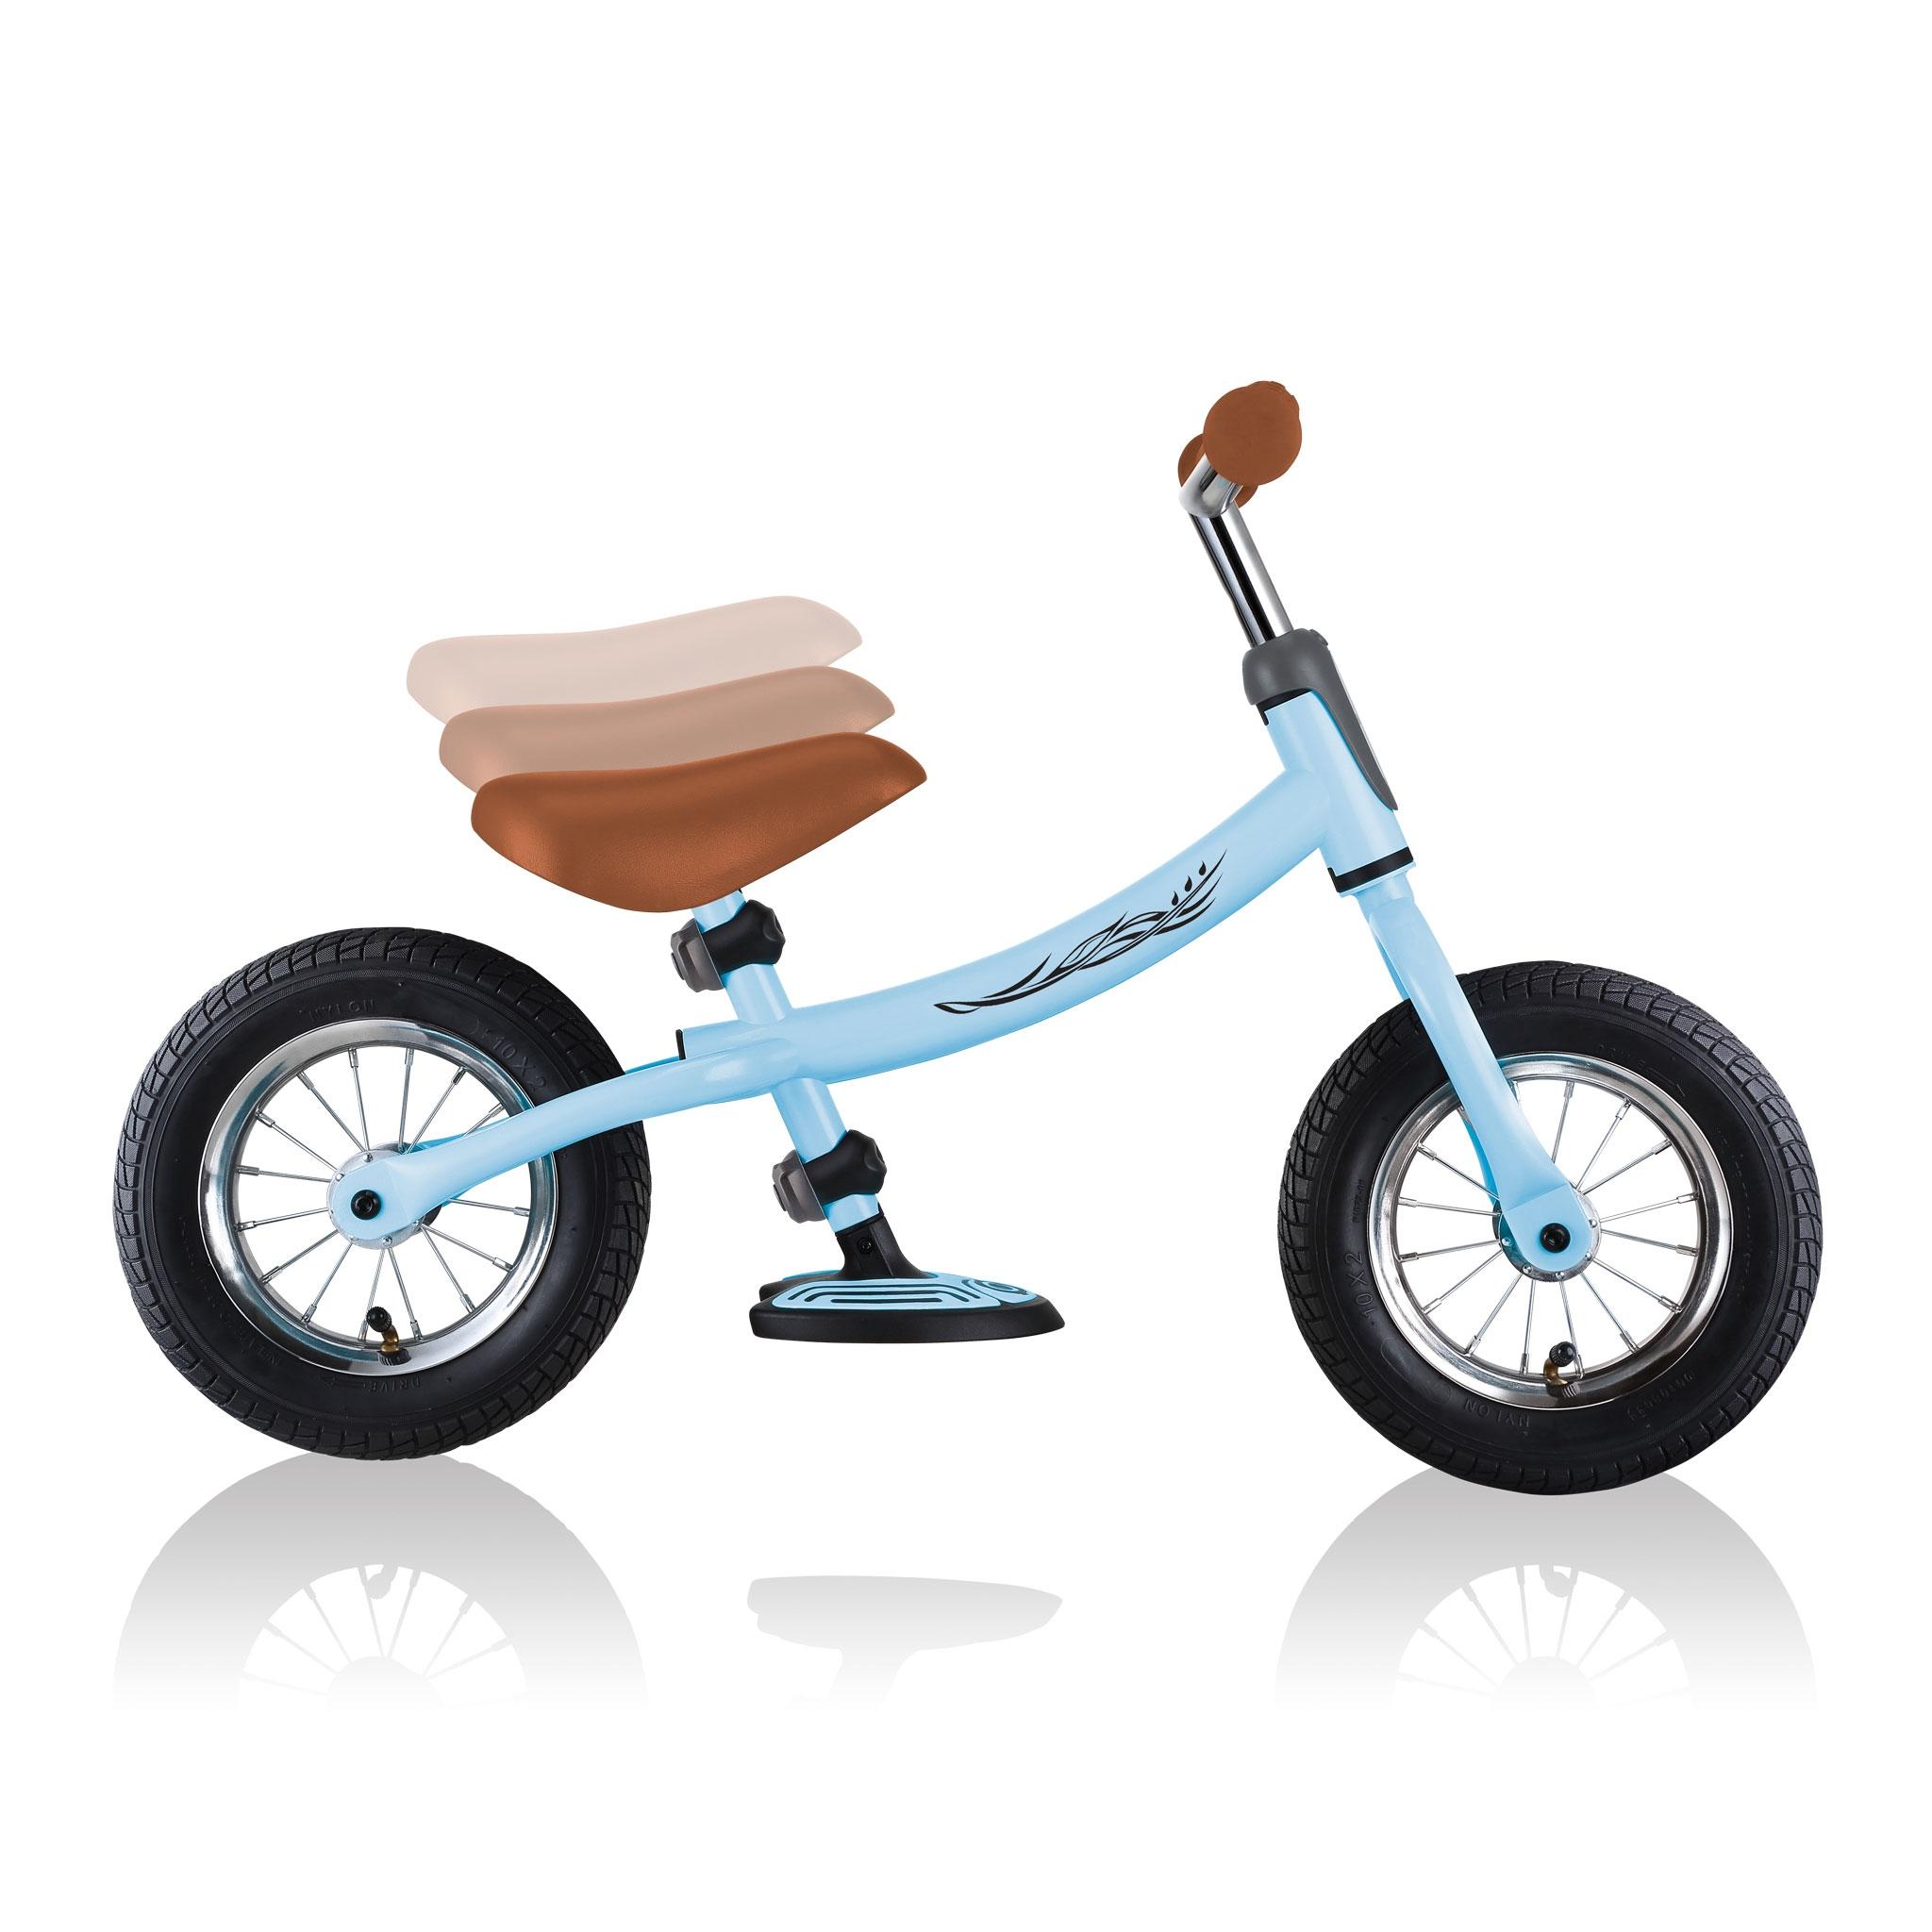 GO-BIKE-AIR-adjustable-toddler-balance-bike-with-6-height-adjustable-saddle-and2-height-adjustable-handlebar_pastel-blue 2